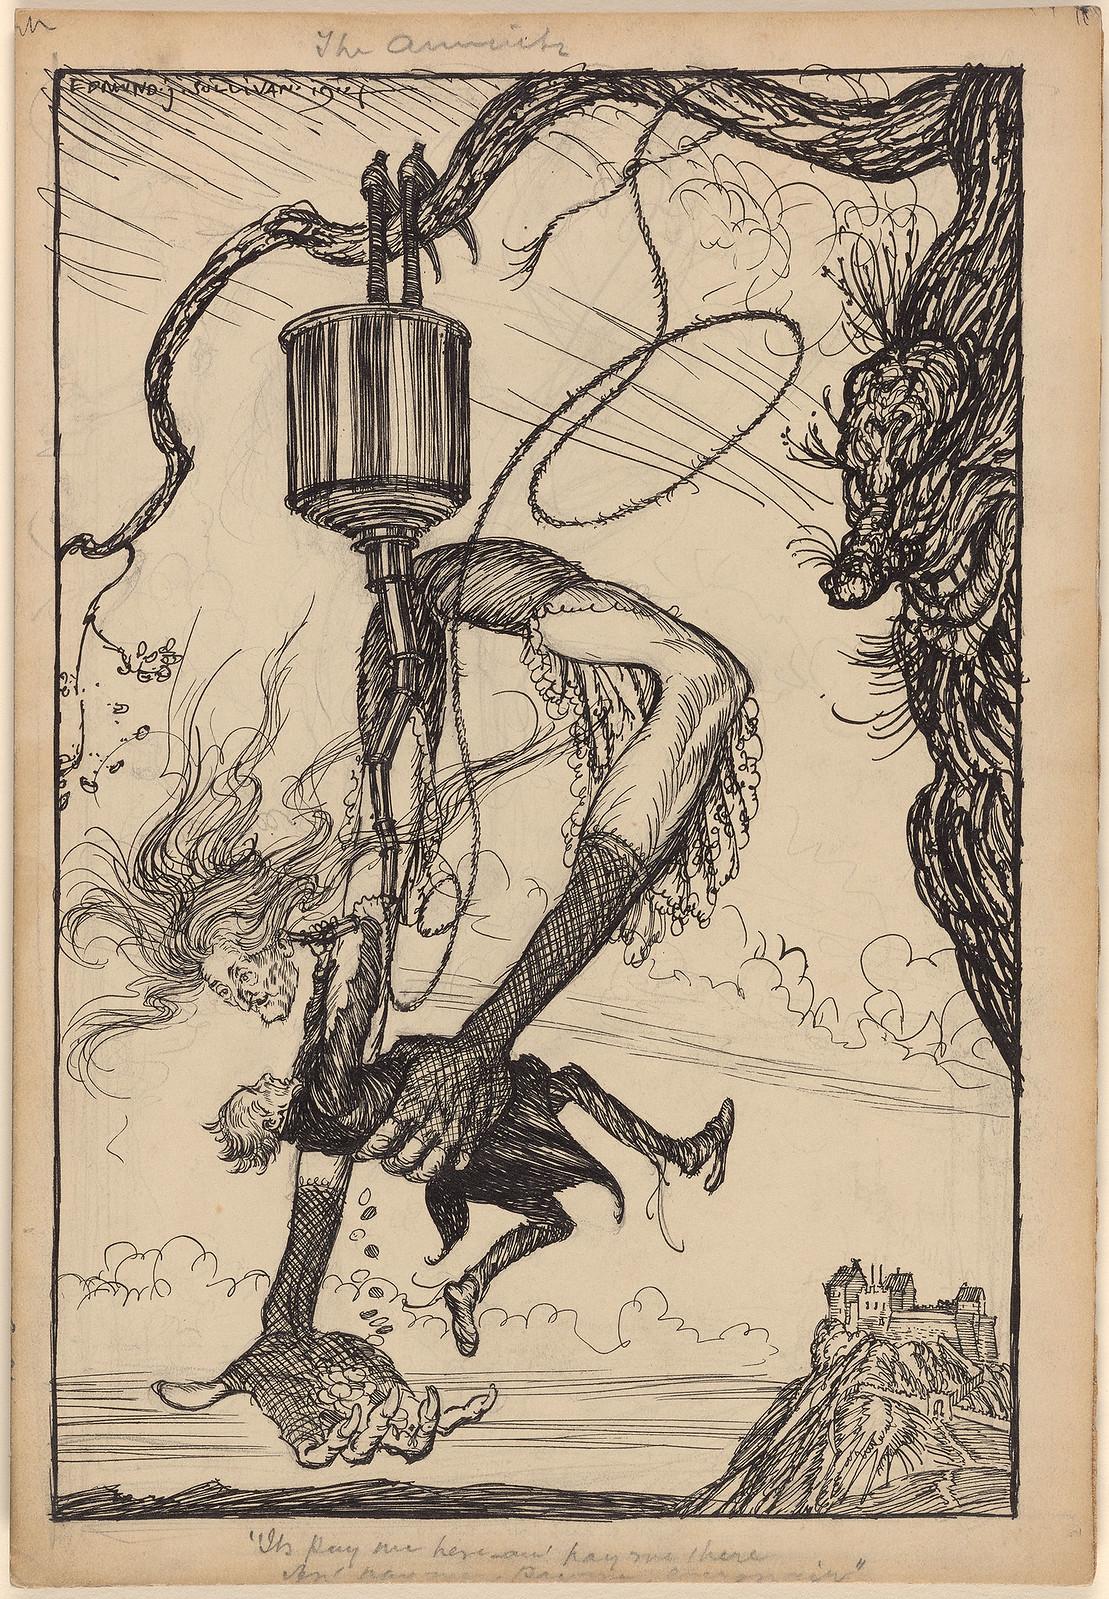 Edmund Joseph Sullivan - The Annuity II, 1914